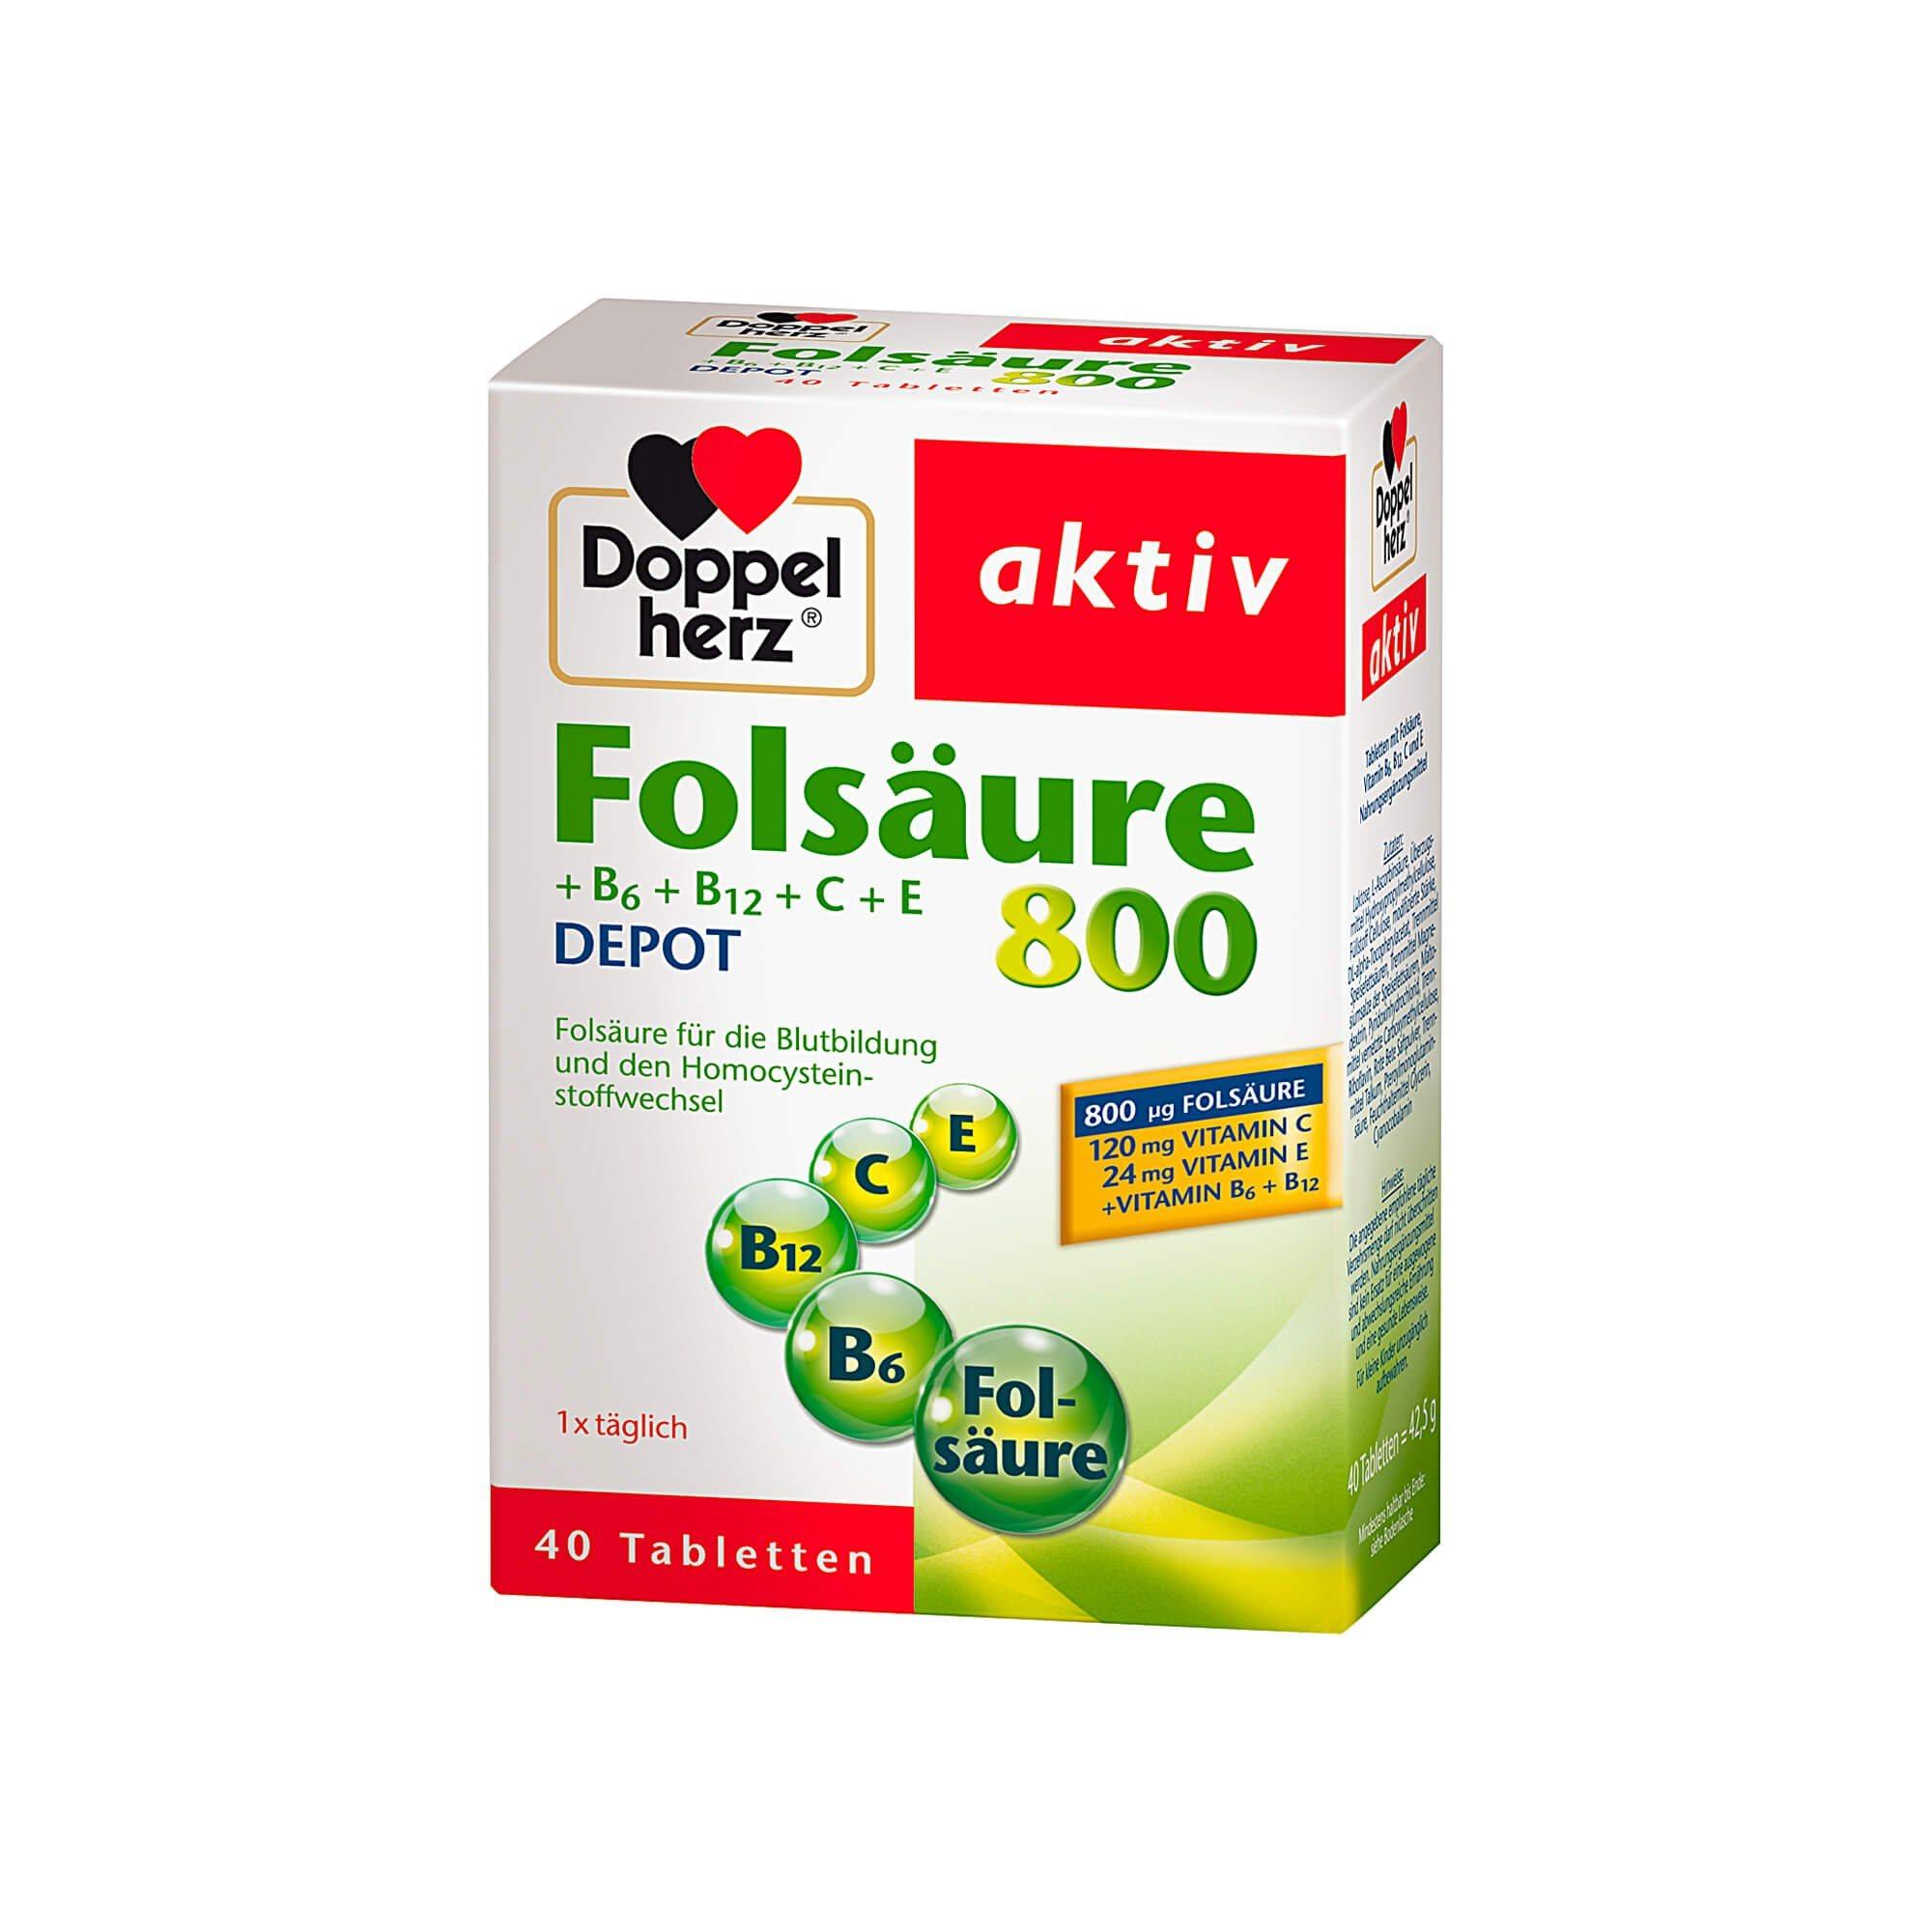 Doppelherz Folsäure 800 + B6 + B12 + C + E Depot aktiv , 40 St